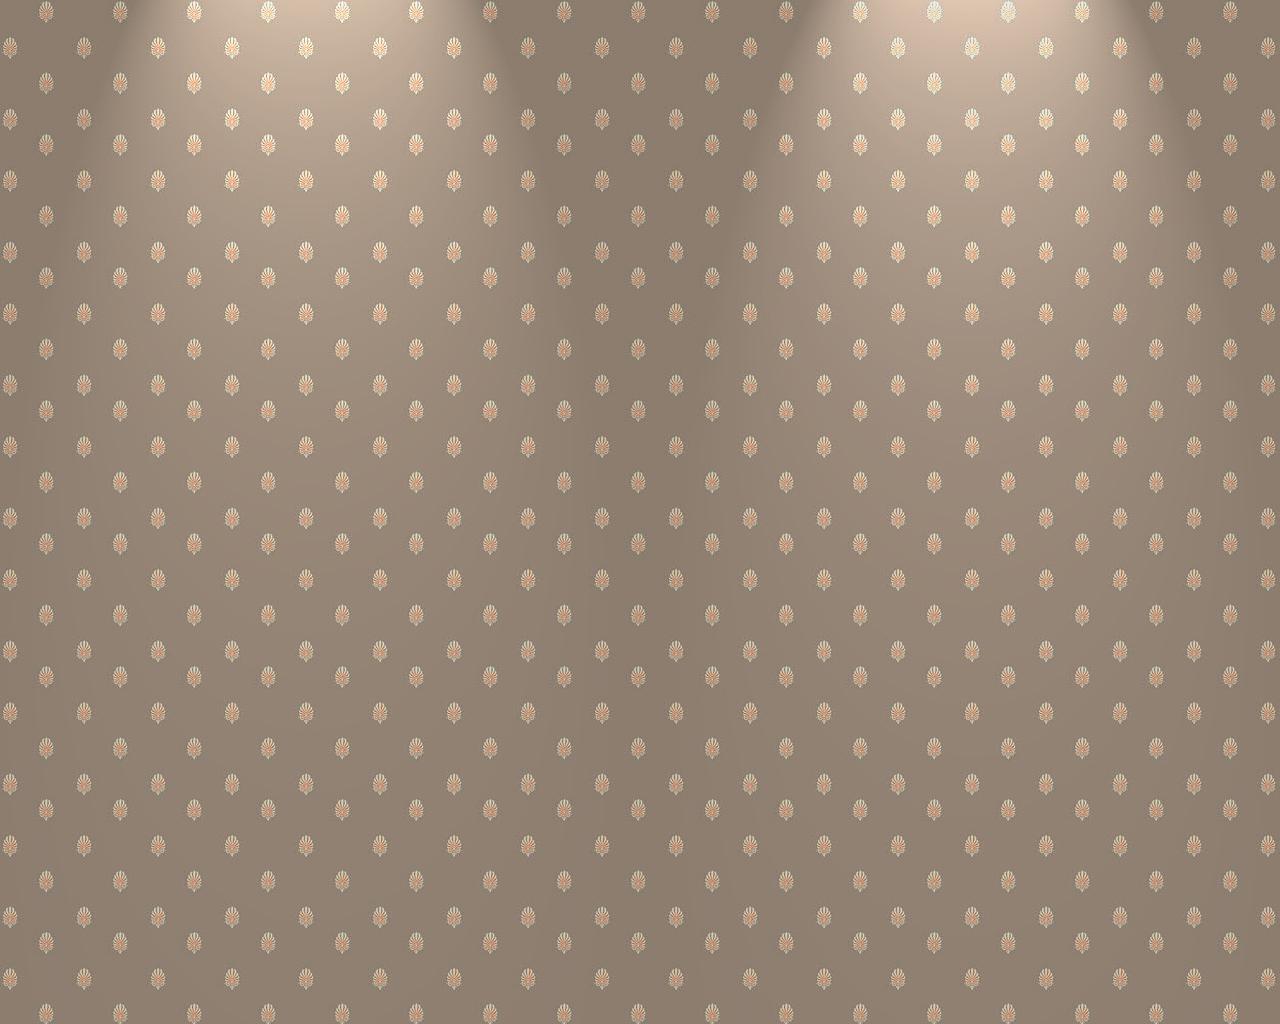 Victorian Pattern Brown Light 1280x1024